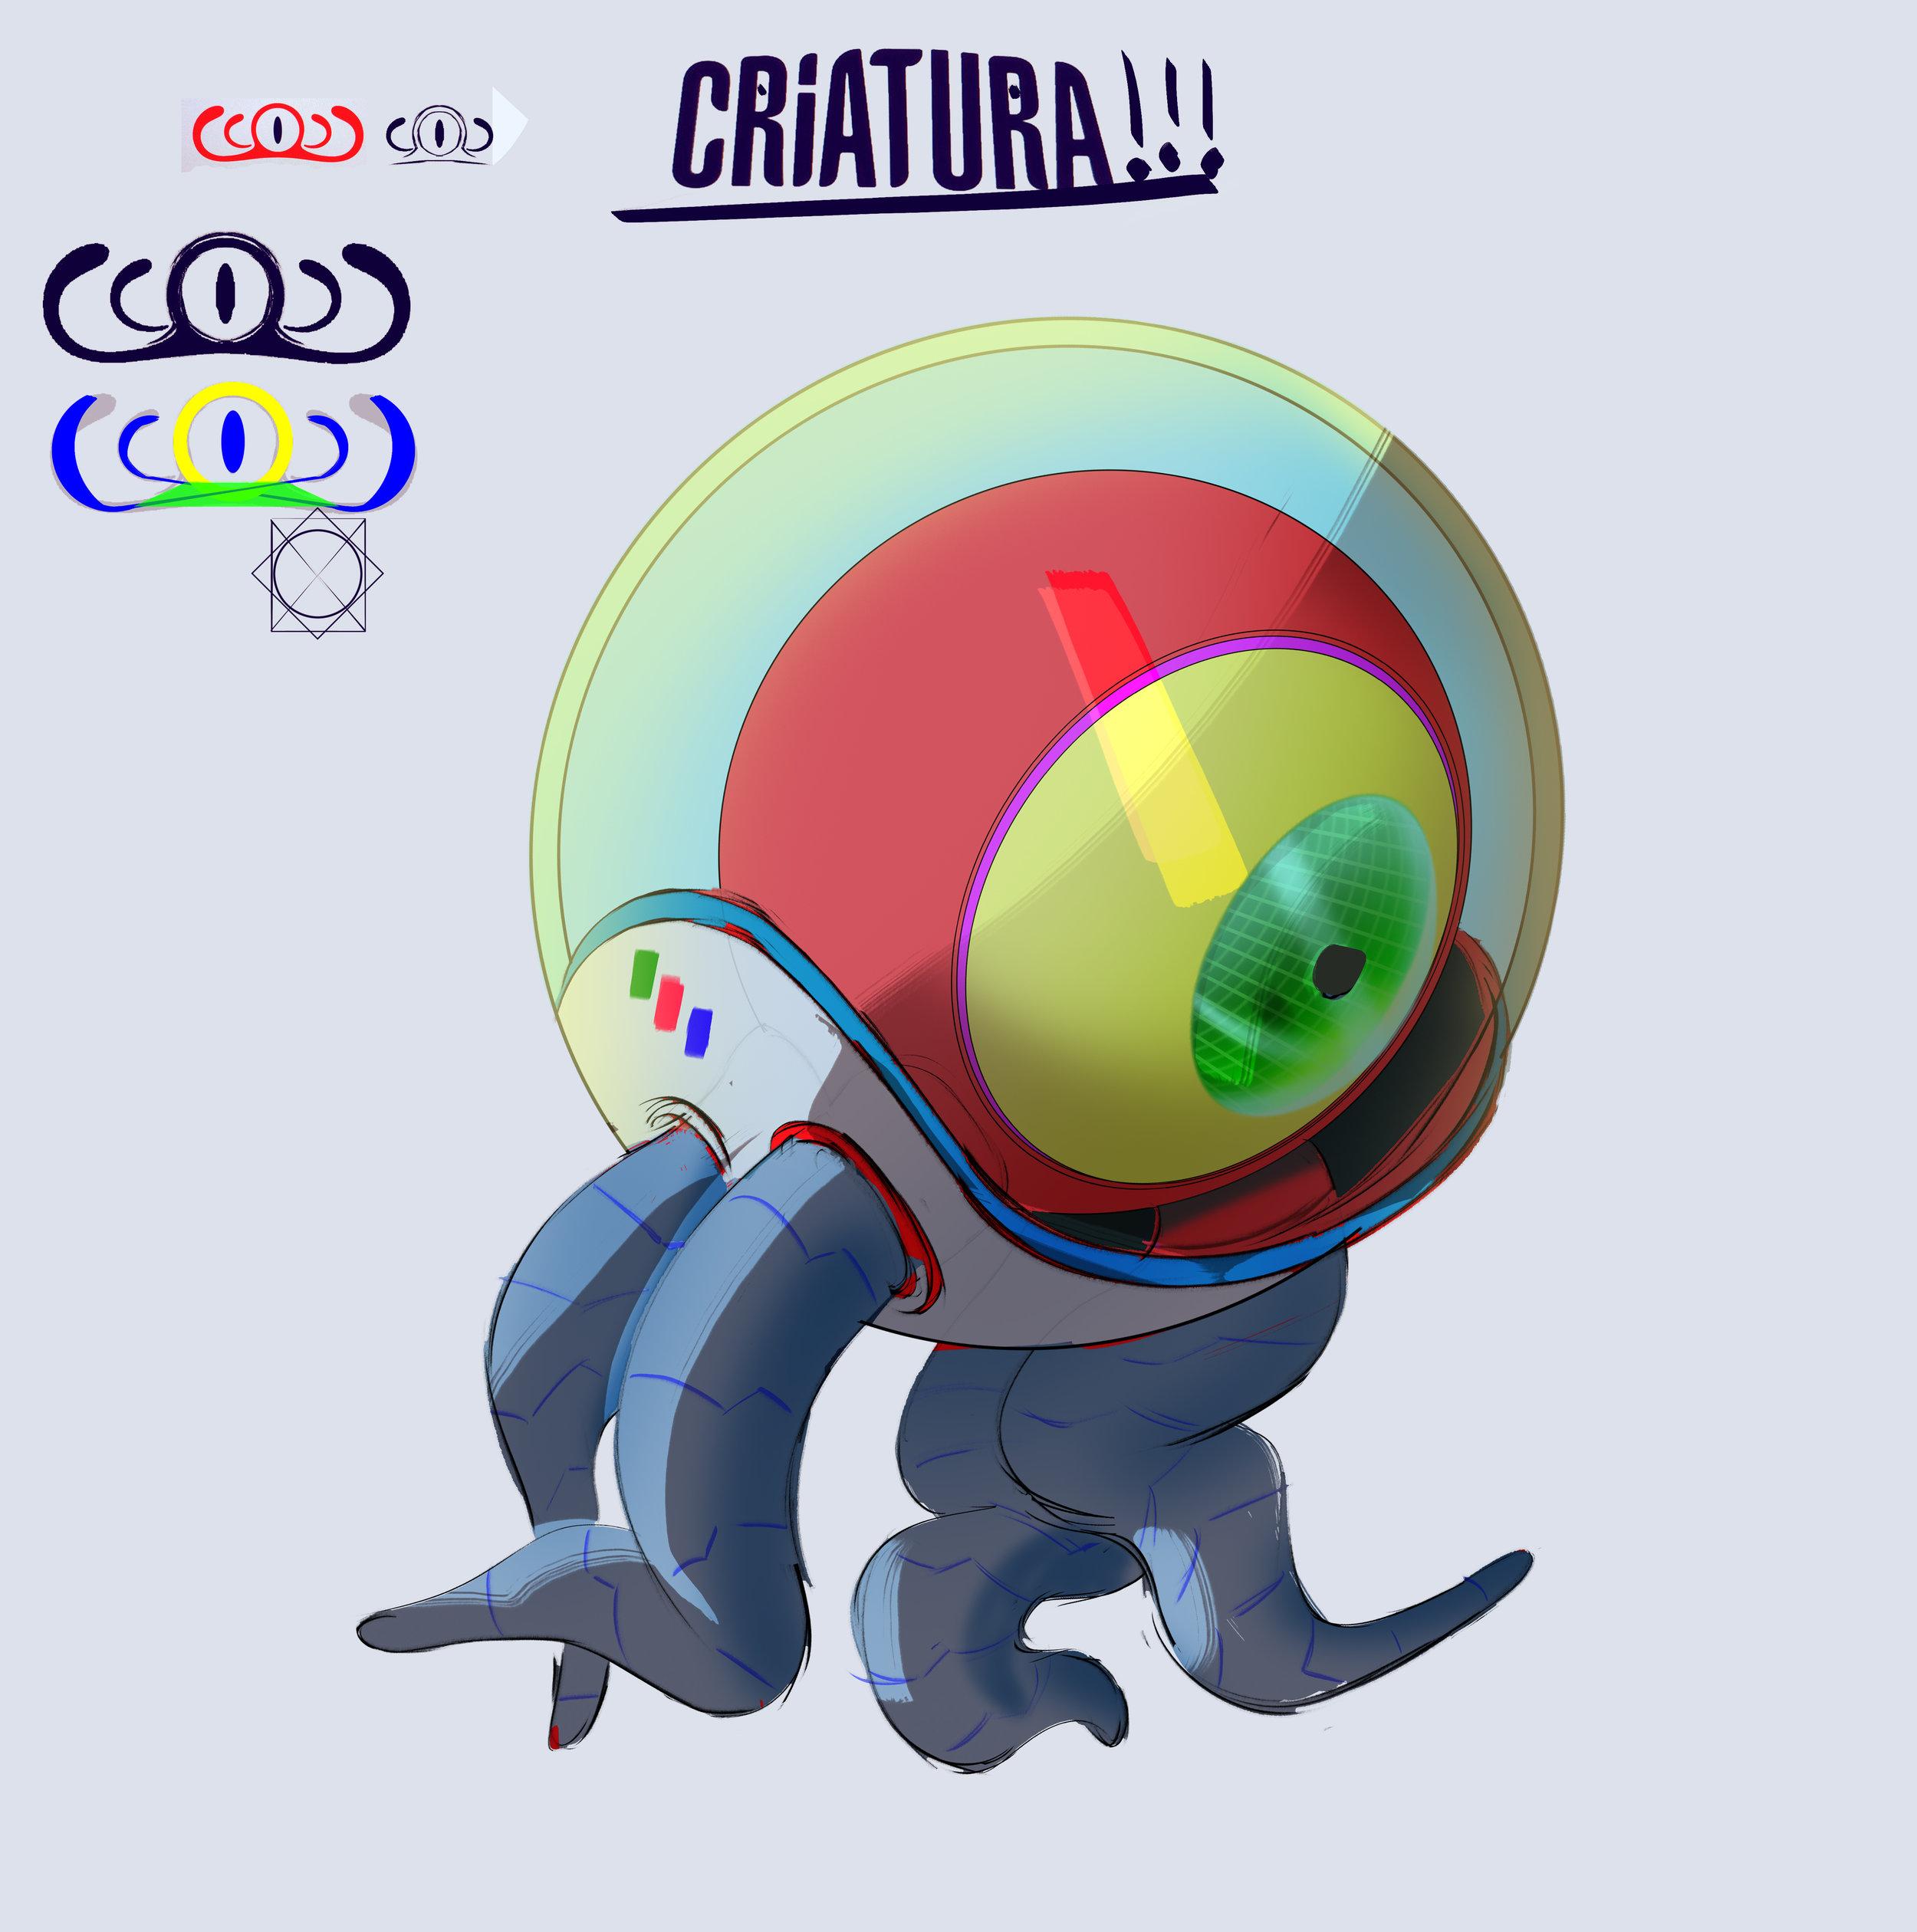 criatura 3.jpg